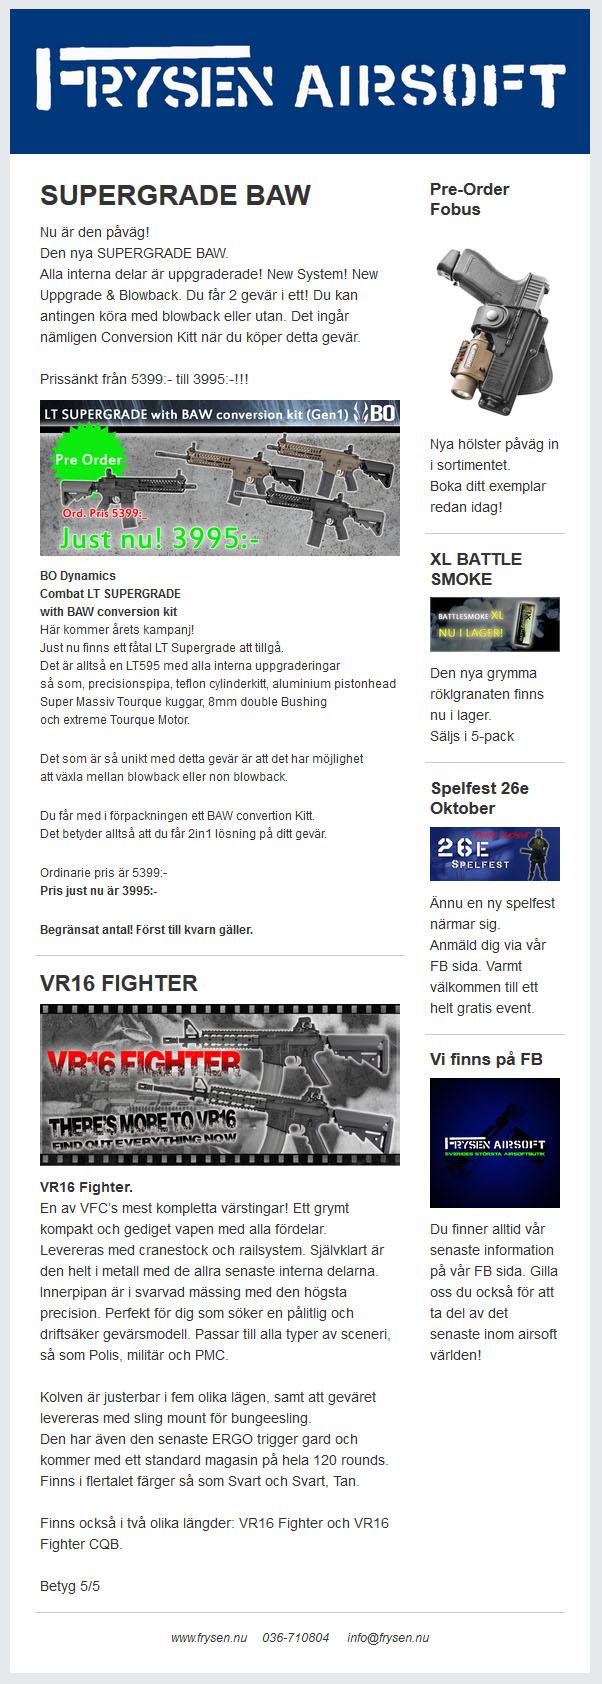 Frysen Airsoft nyhetsbrev oktober 2014